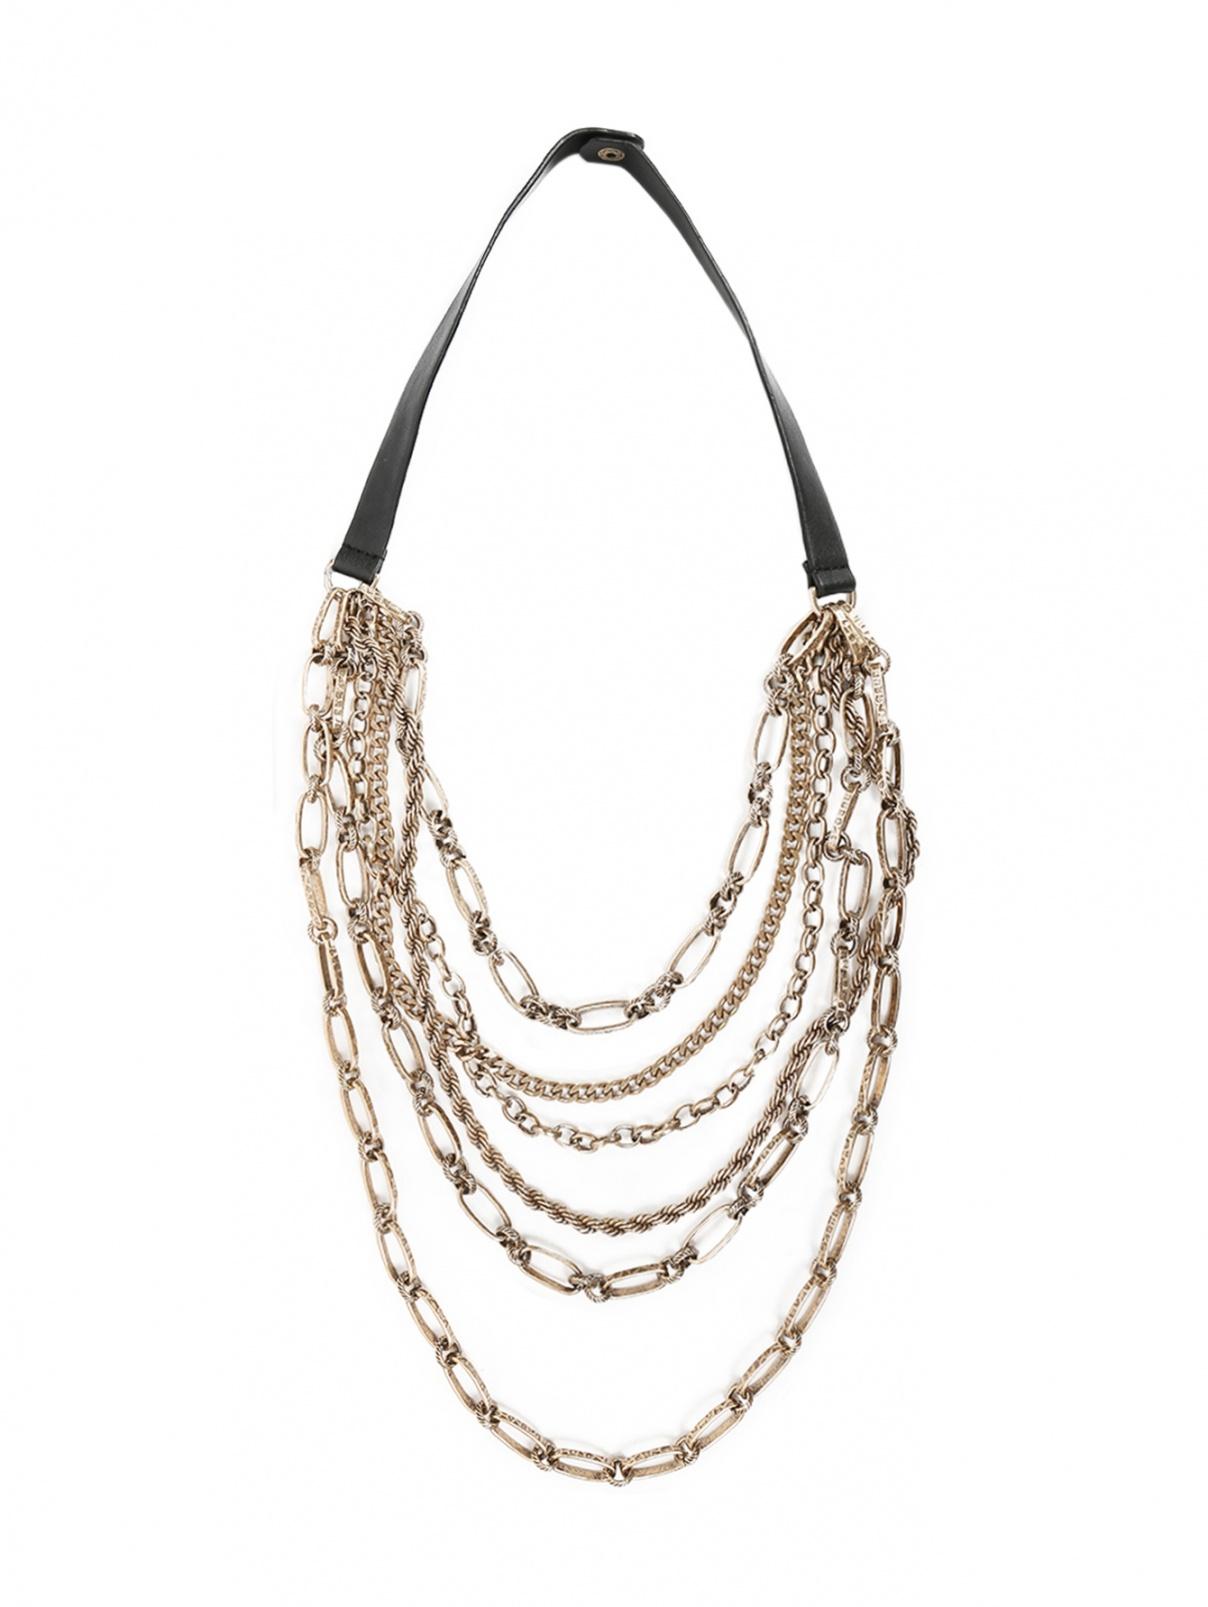 Ожерелье из цепей и кожи Persona by Marina Rinaldi  –  Общий вид